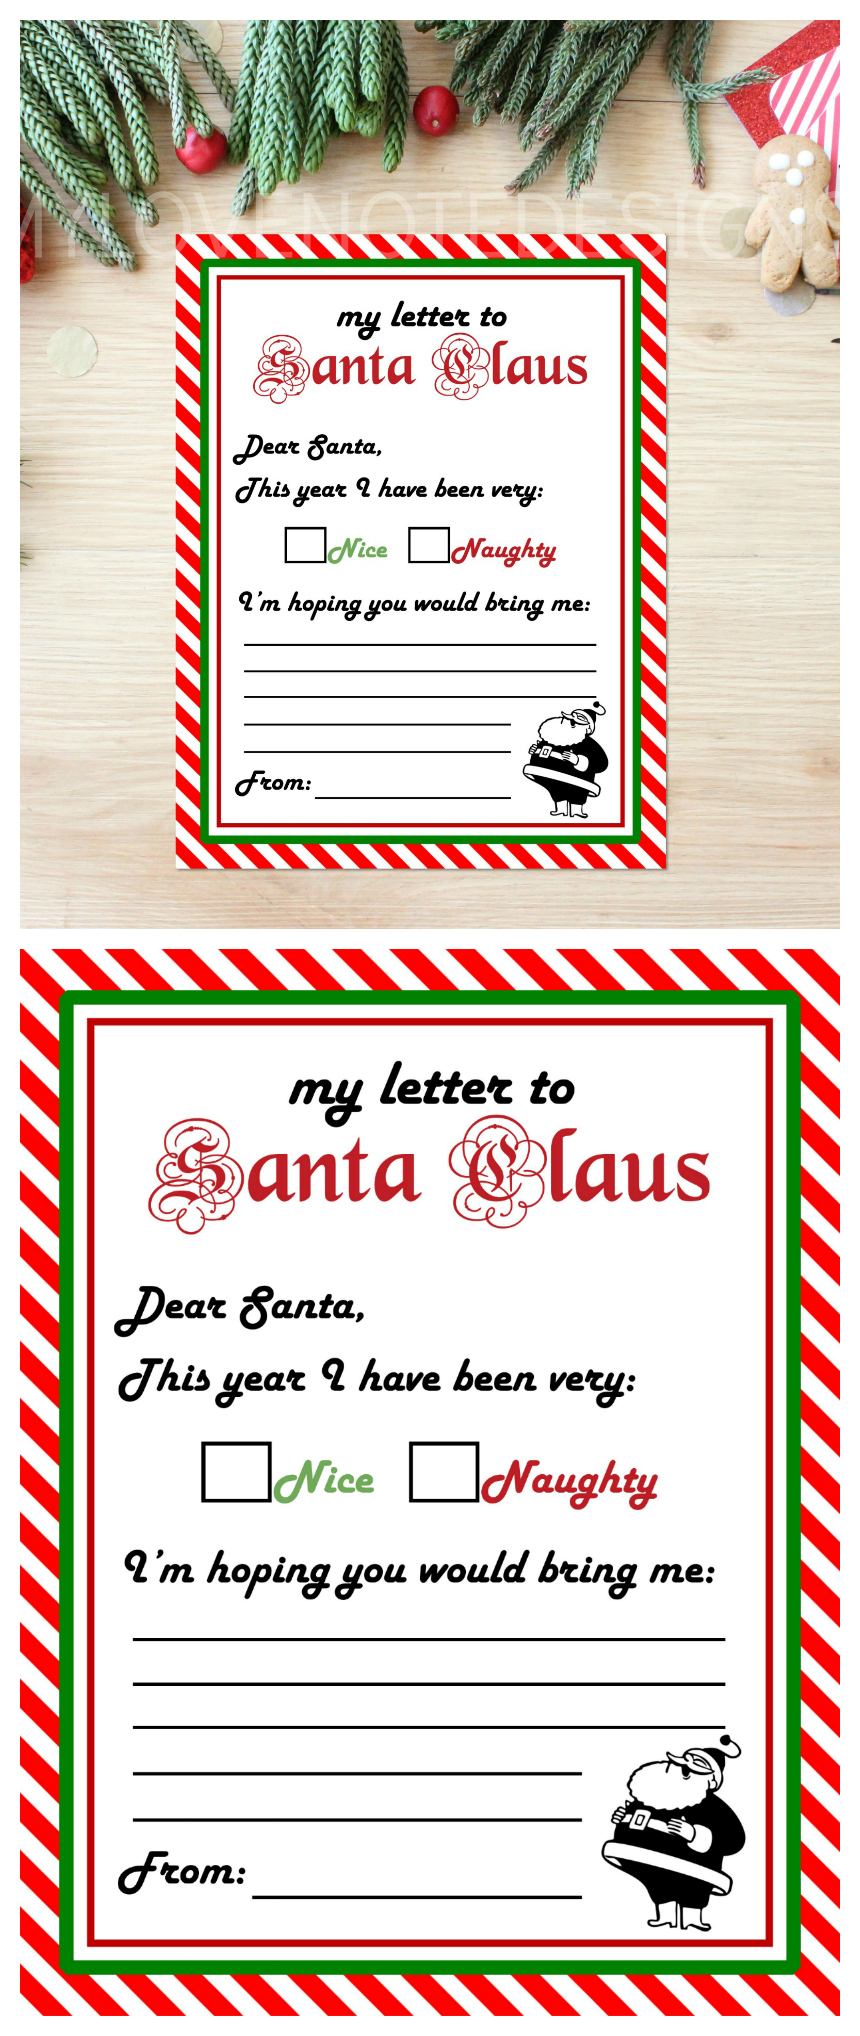 Free Printable Santa Claus Letter